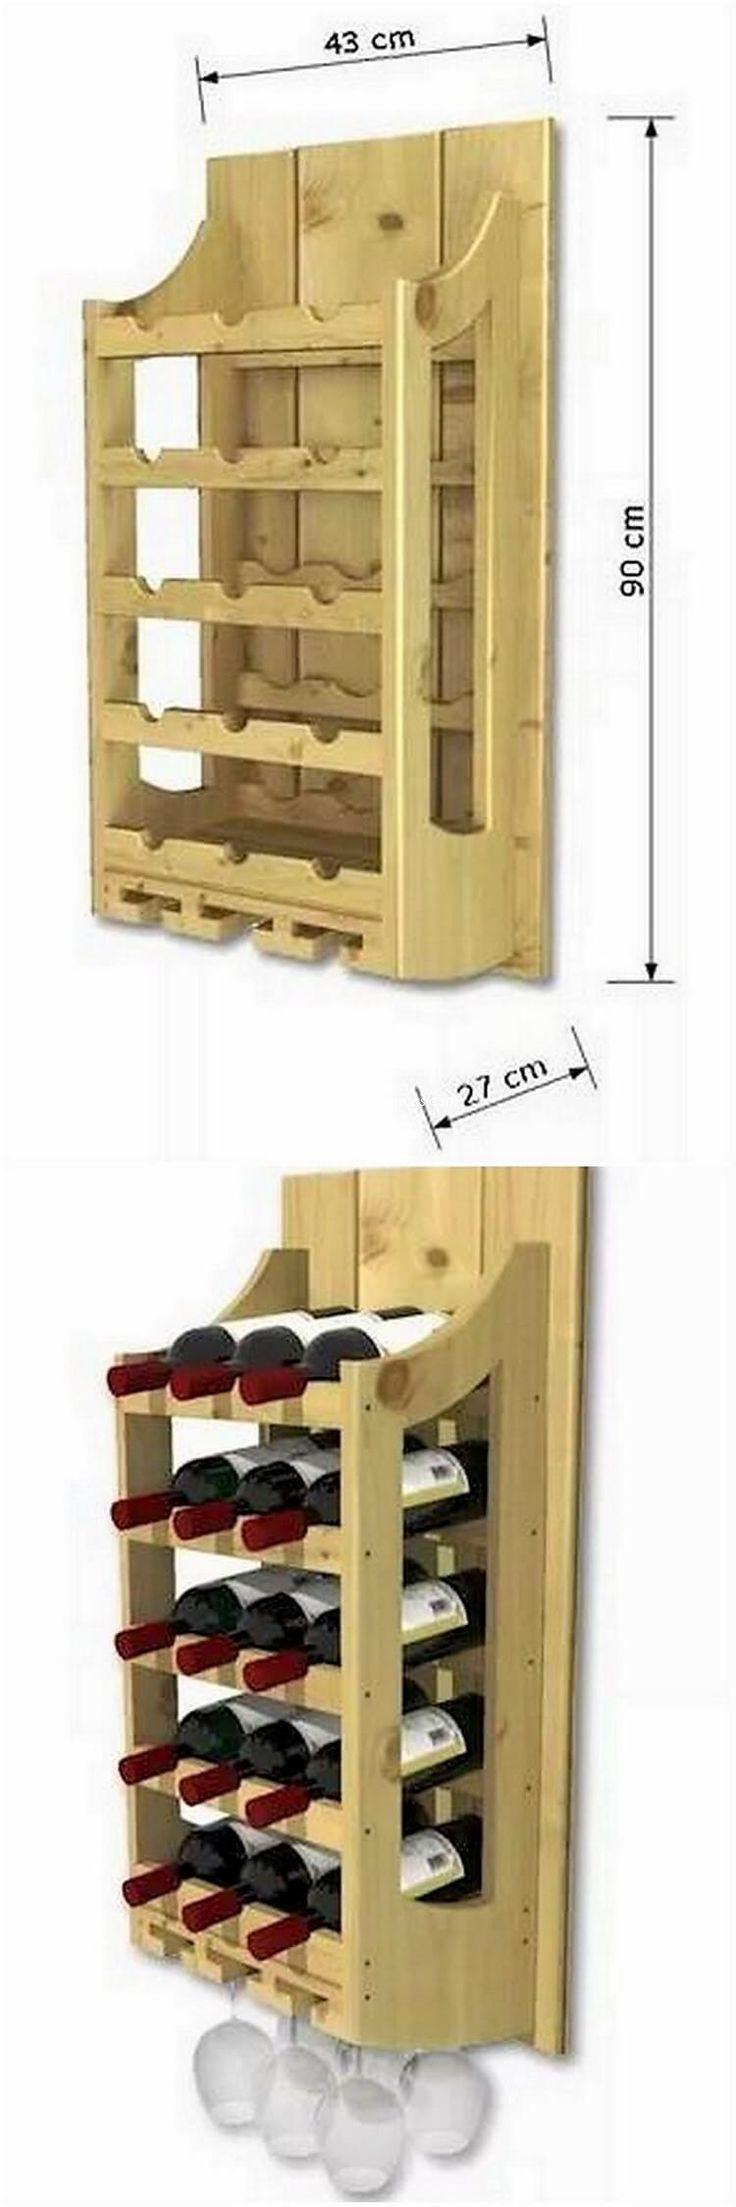 266 best herraduras cavas images on Pinterest   Wine racks, Bottle ...